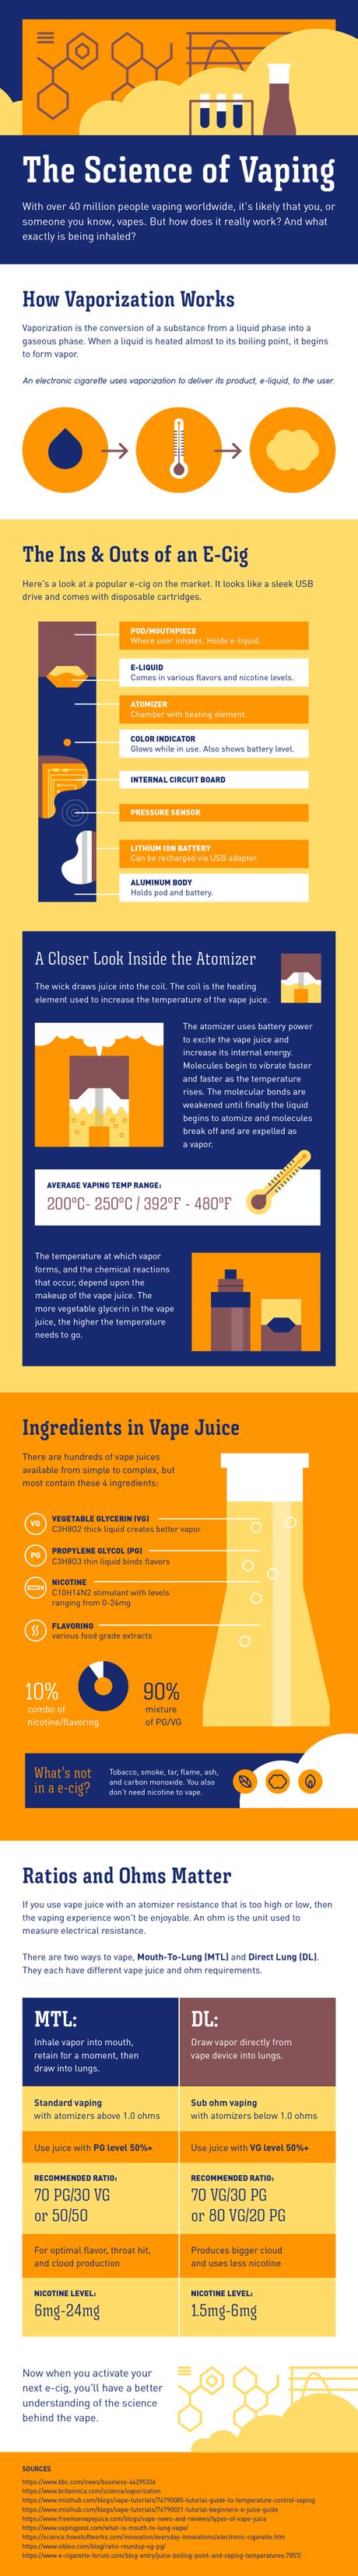 Is Vaping Dangerous? – The Science of Vaping